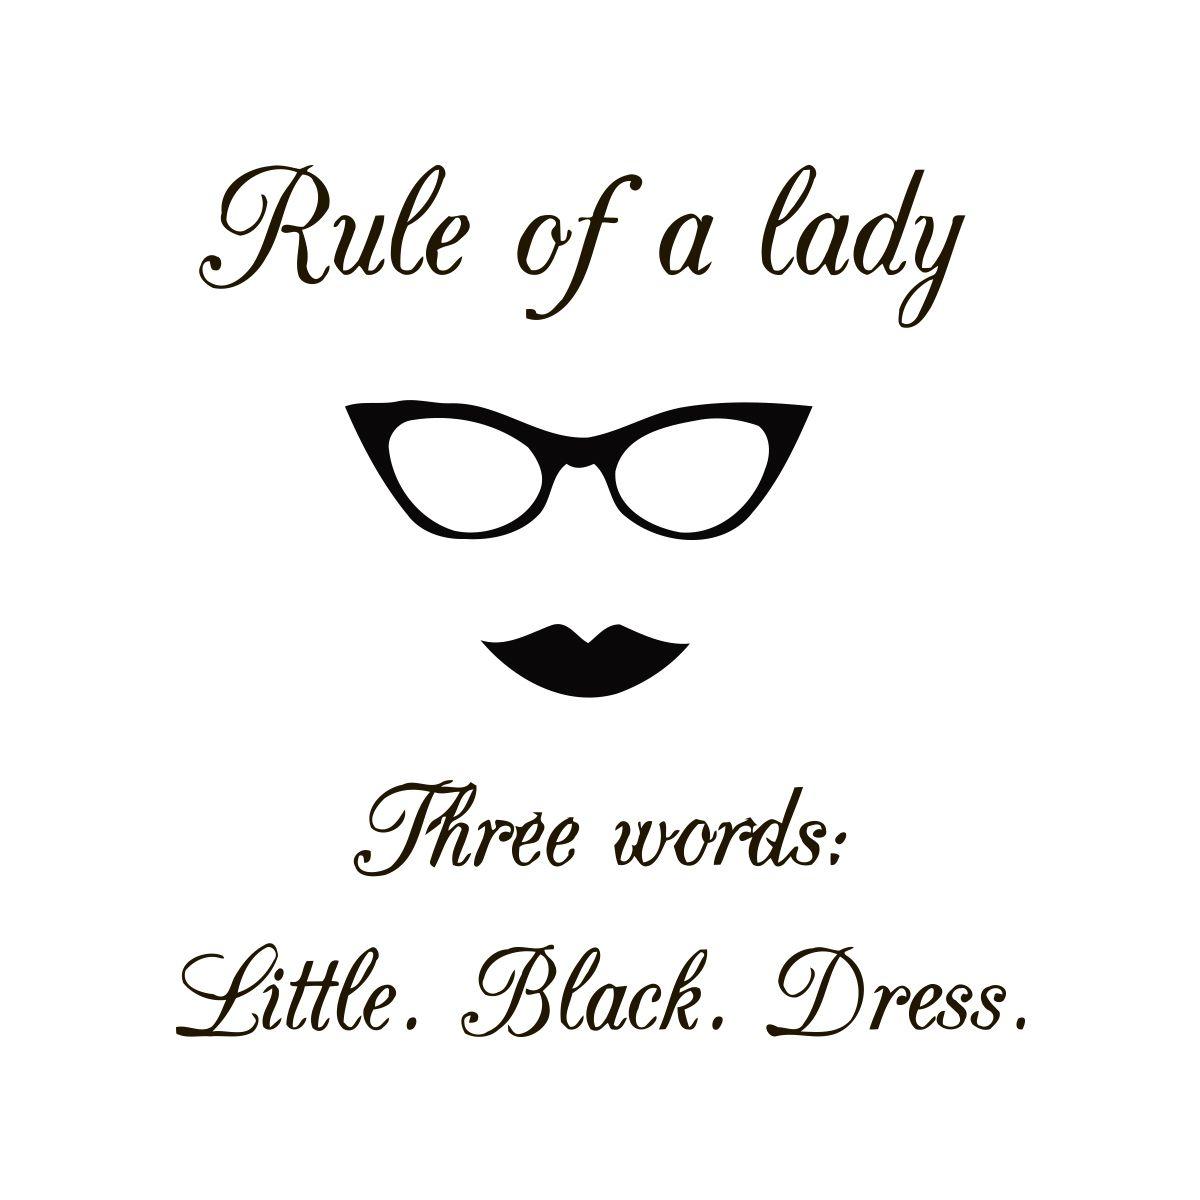 Little black dress quote